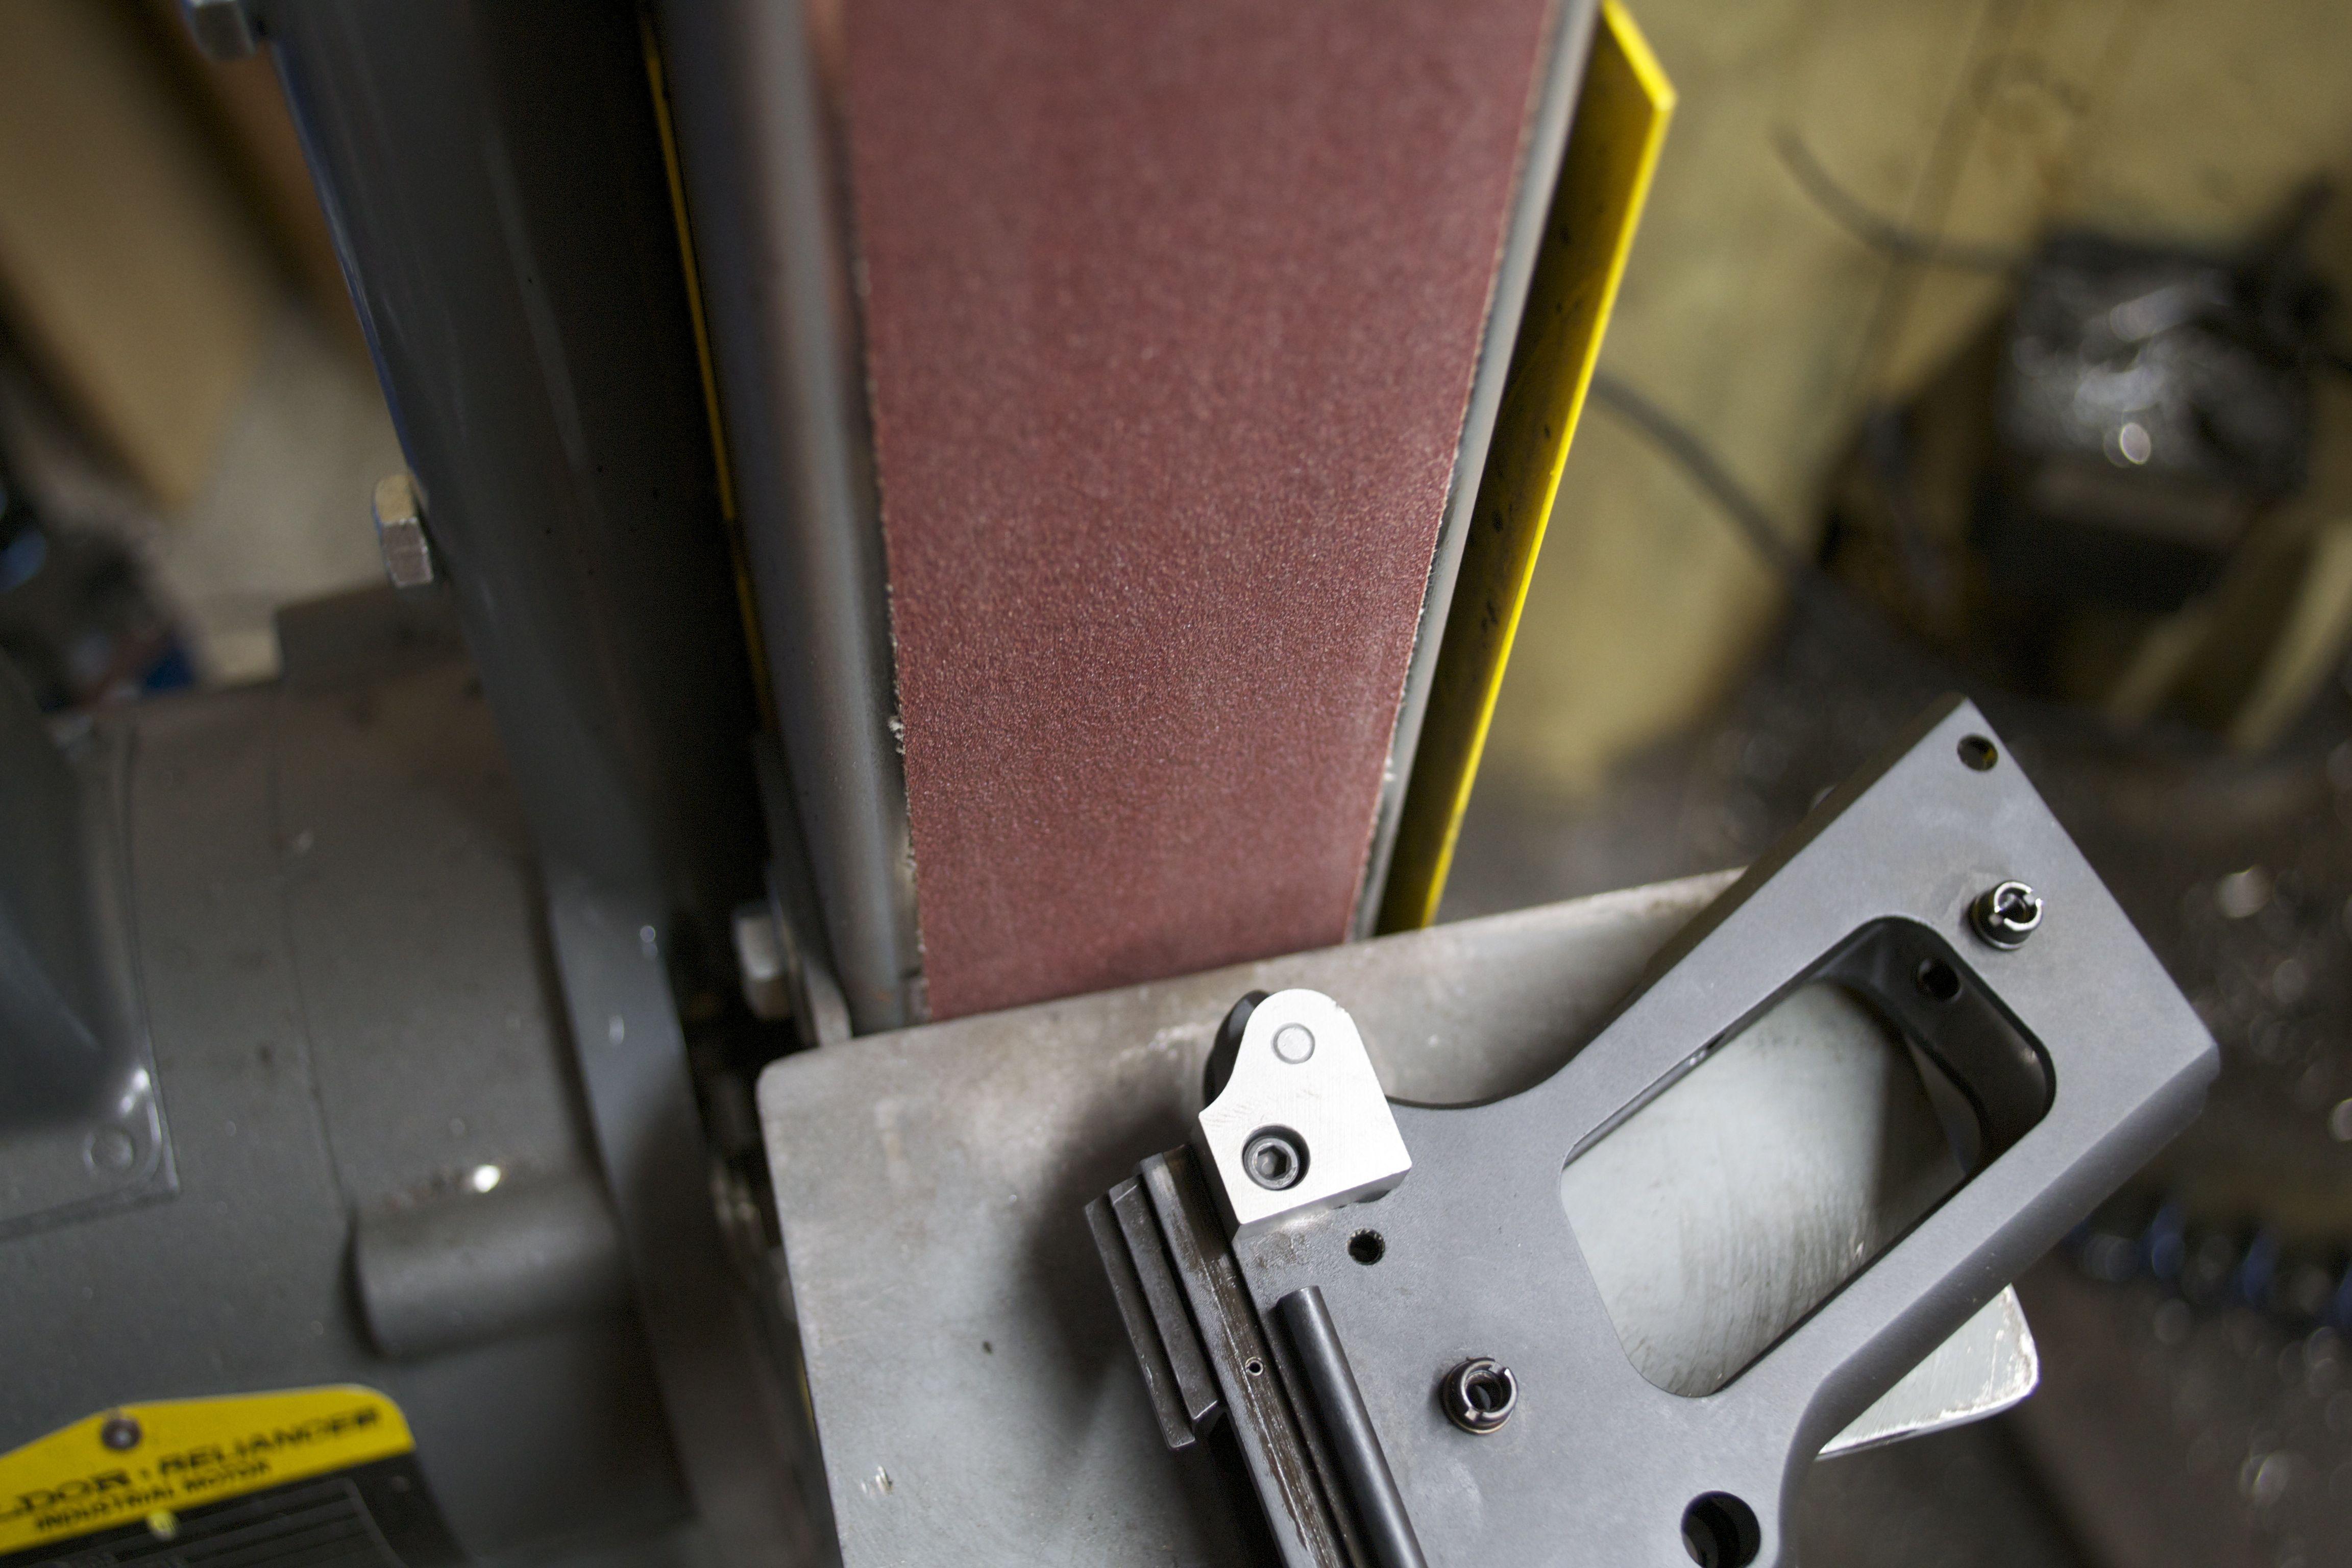 r1 beavertail on grinder